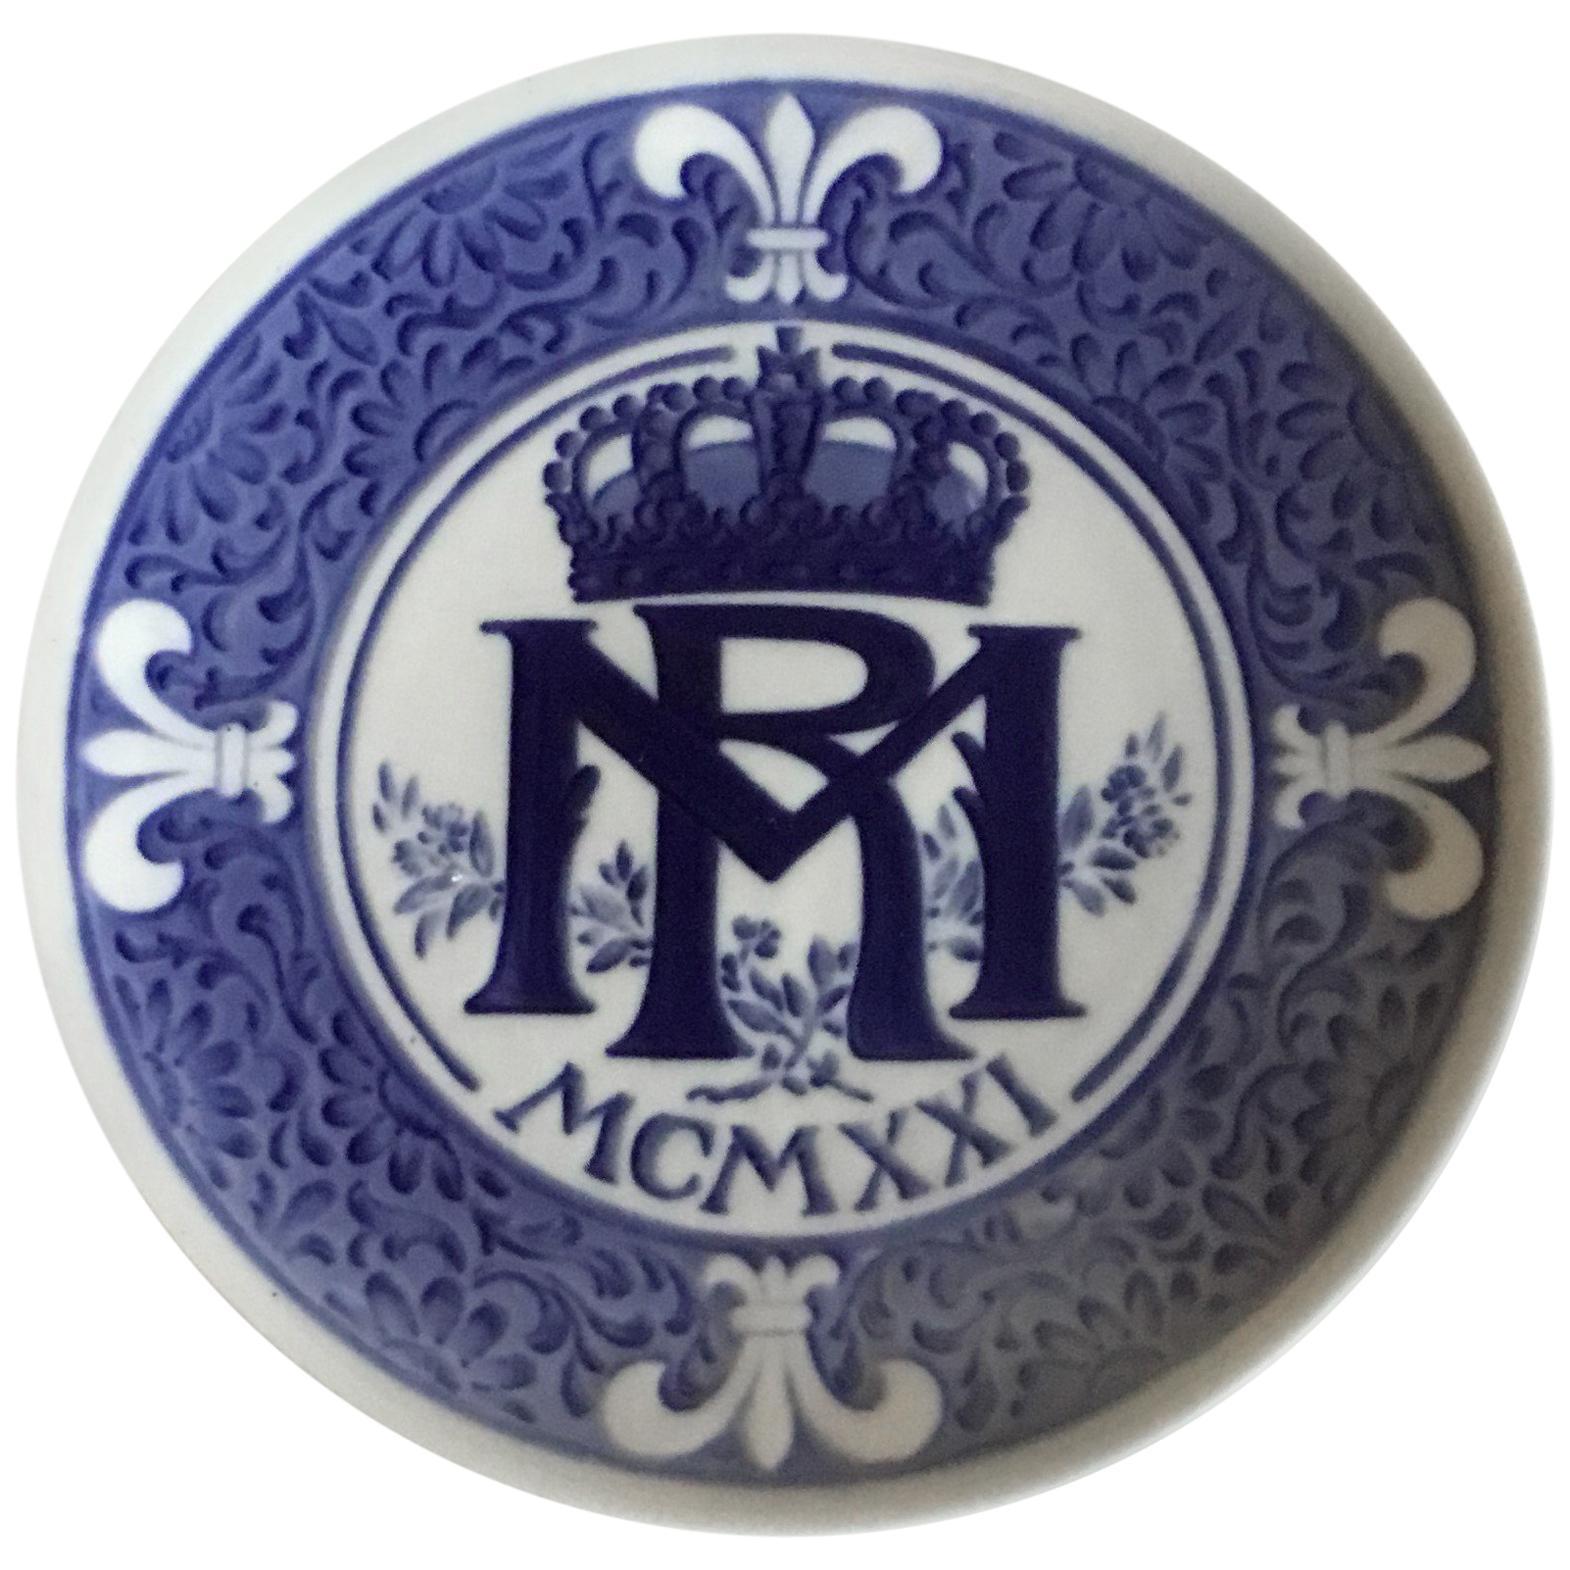 Royal Copenhagen Commemorative Plate from 1921 RC-CM200